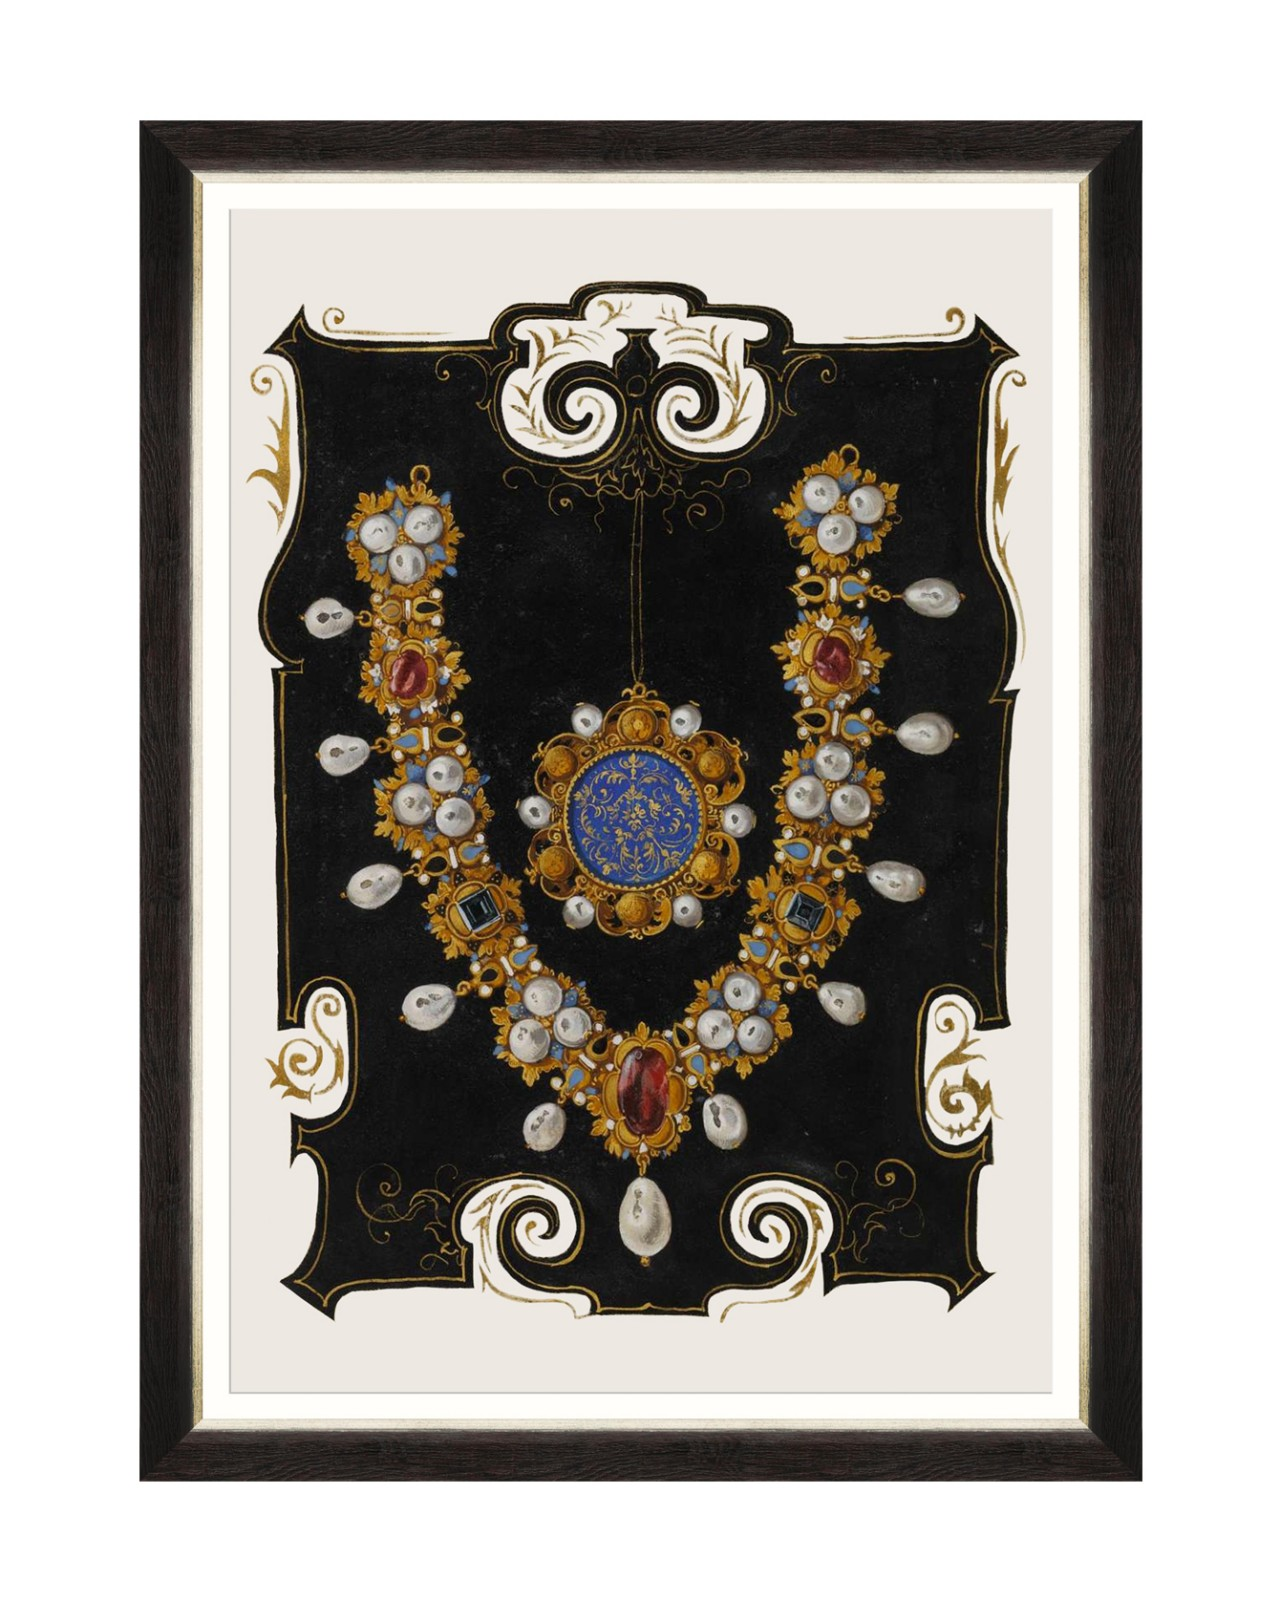 ANNA'S JEWELRY III Framed Art